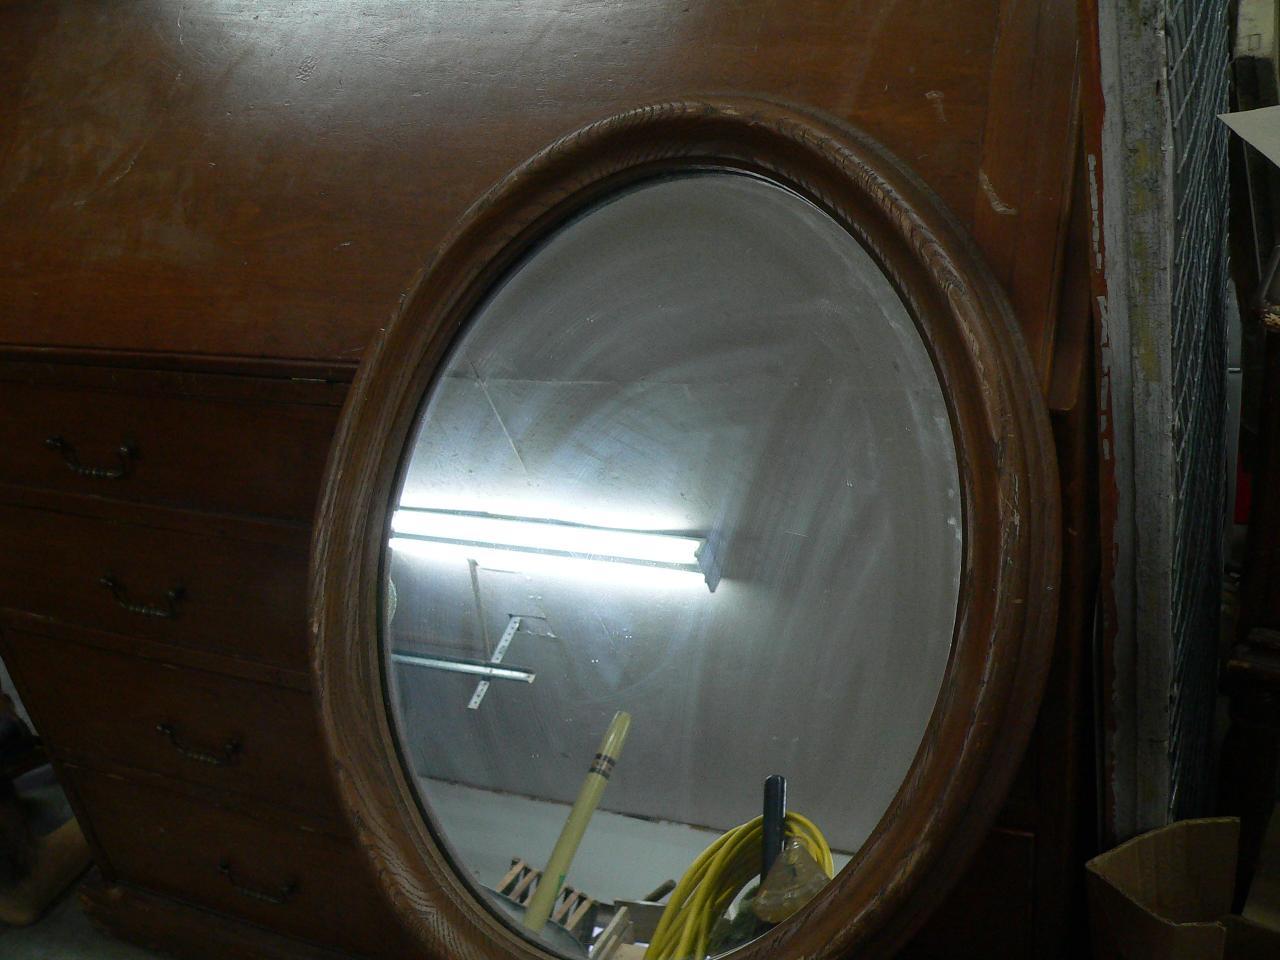 Miroir ovale # 4678